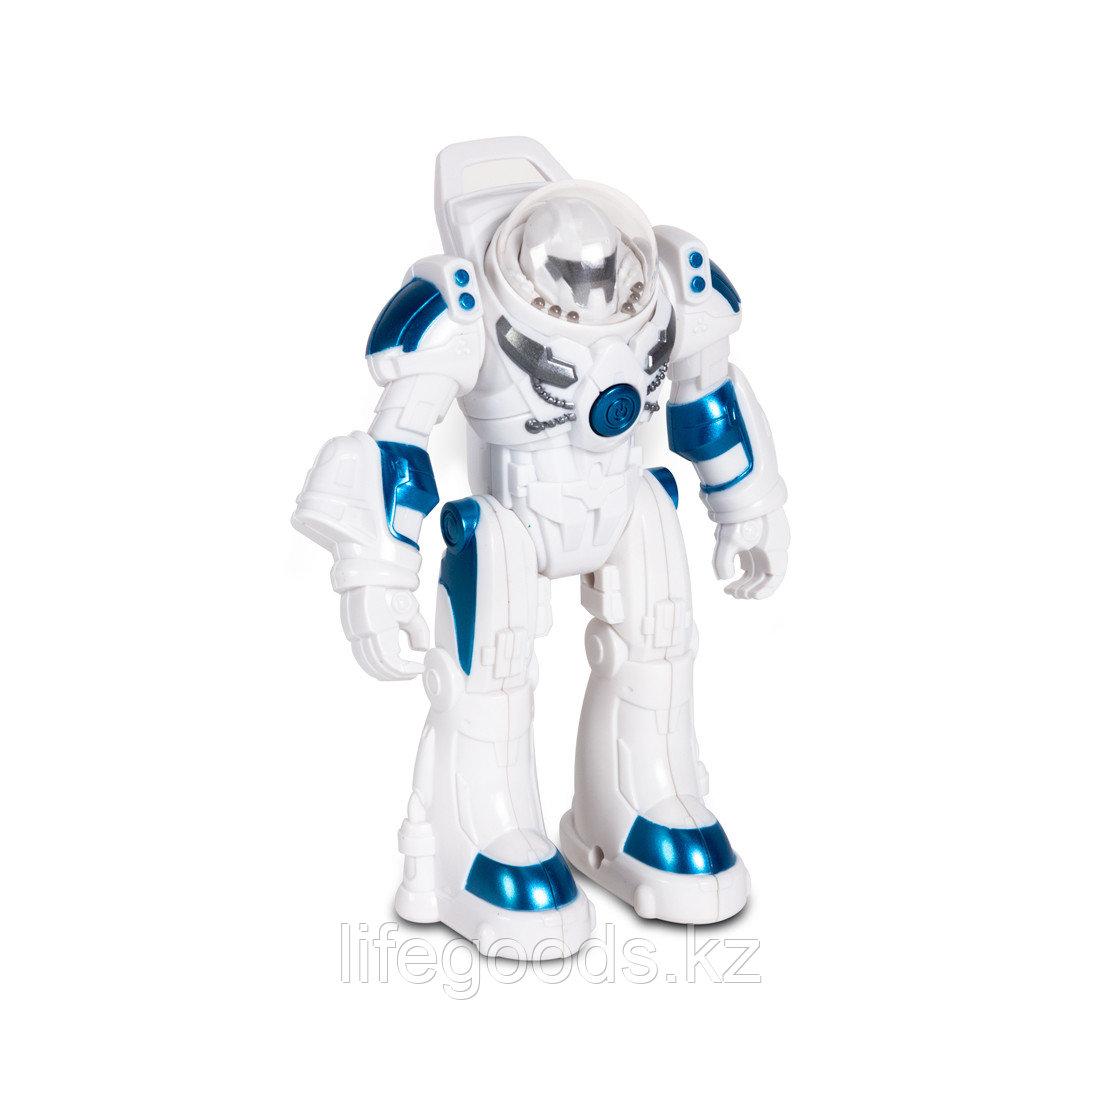 Робот RASTAR 1:32 MINI RS Robot - Spaceman 77100W